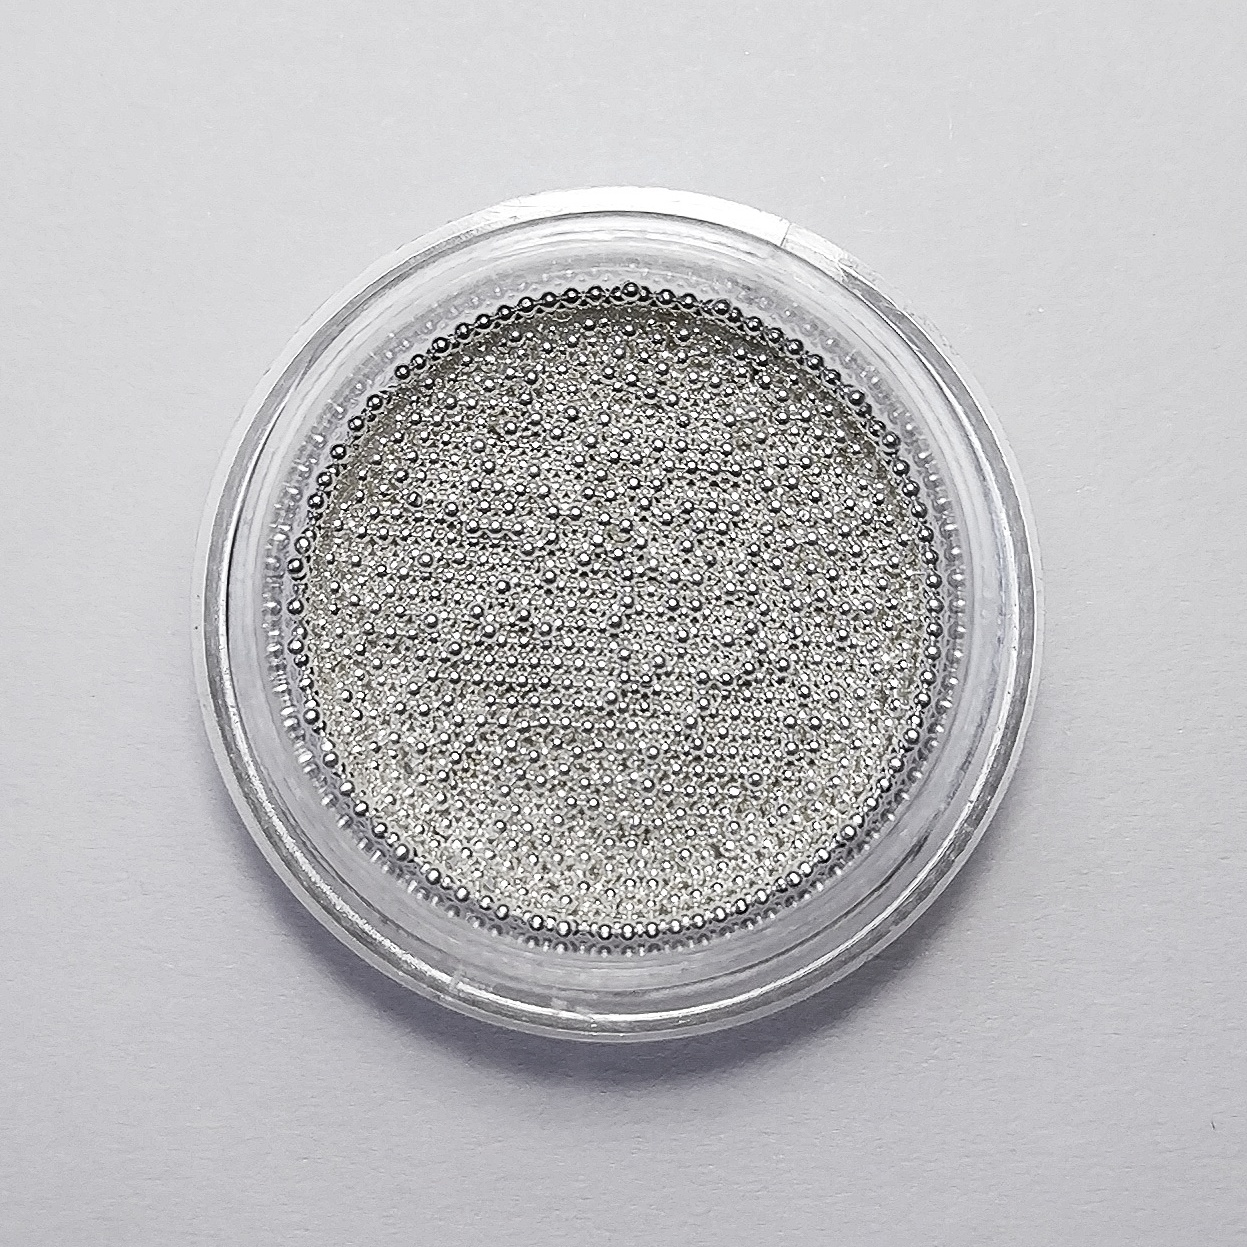 цена на Бульонки металлические 0,8 мм, серебро